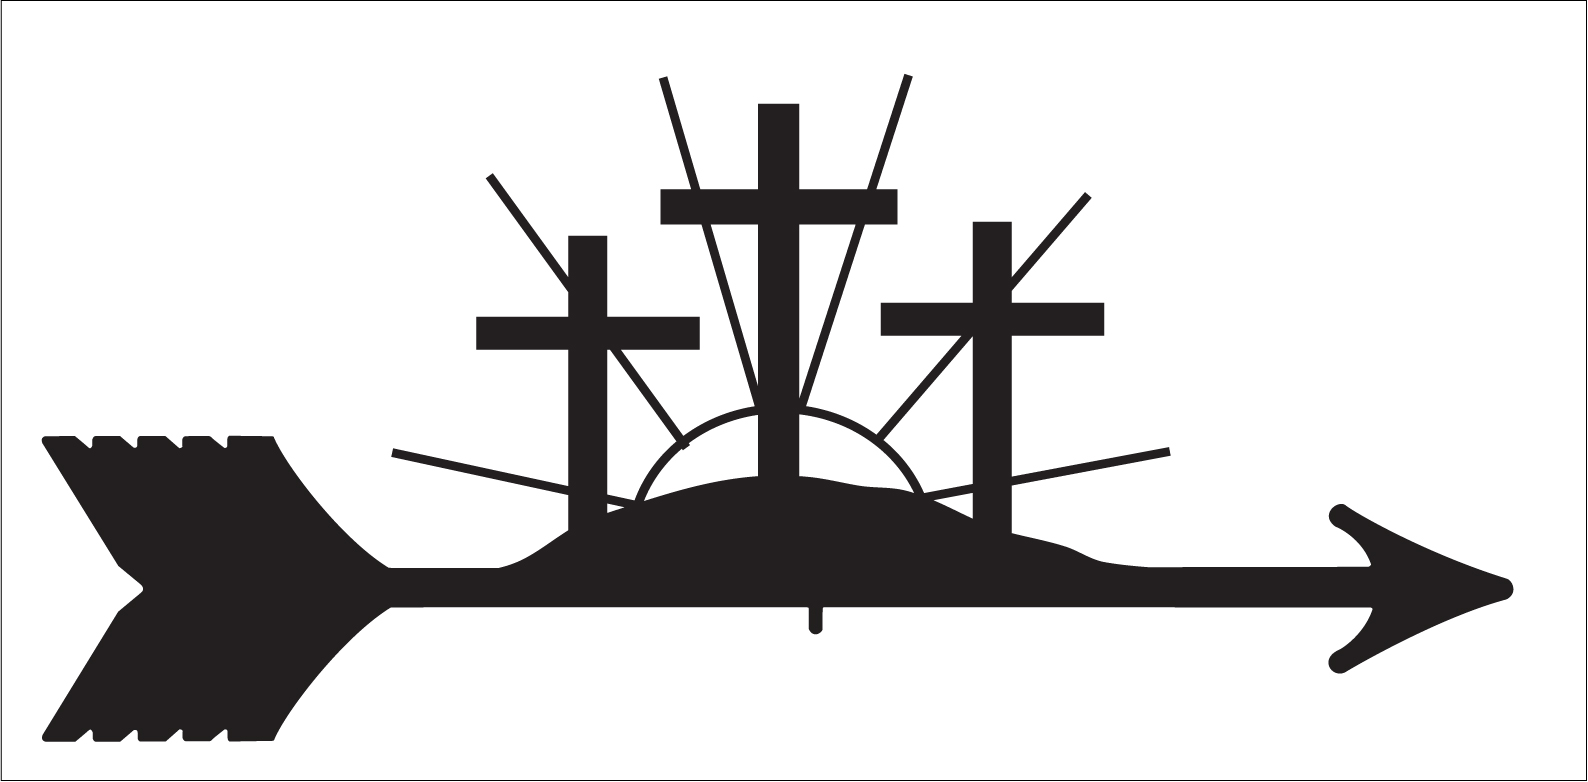 3 Crosses Clipart 24 Free Cliparts